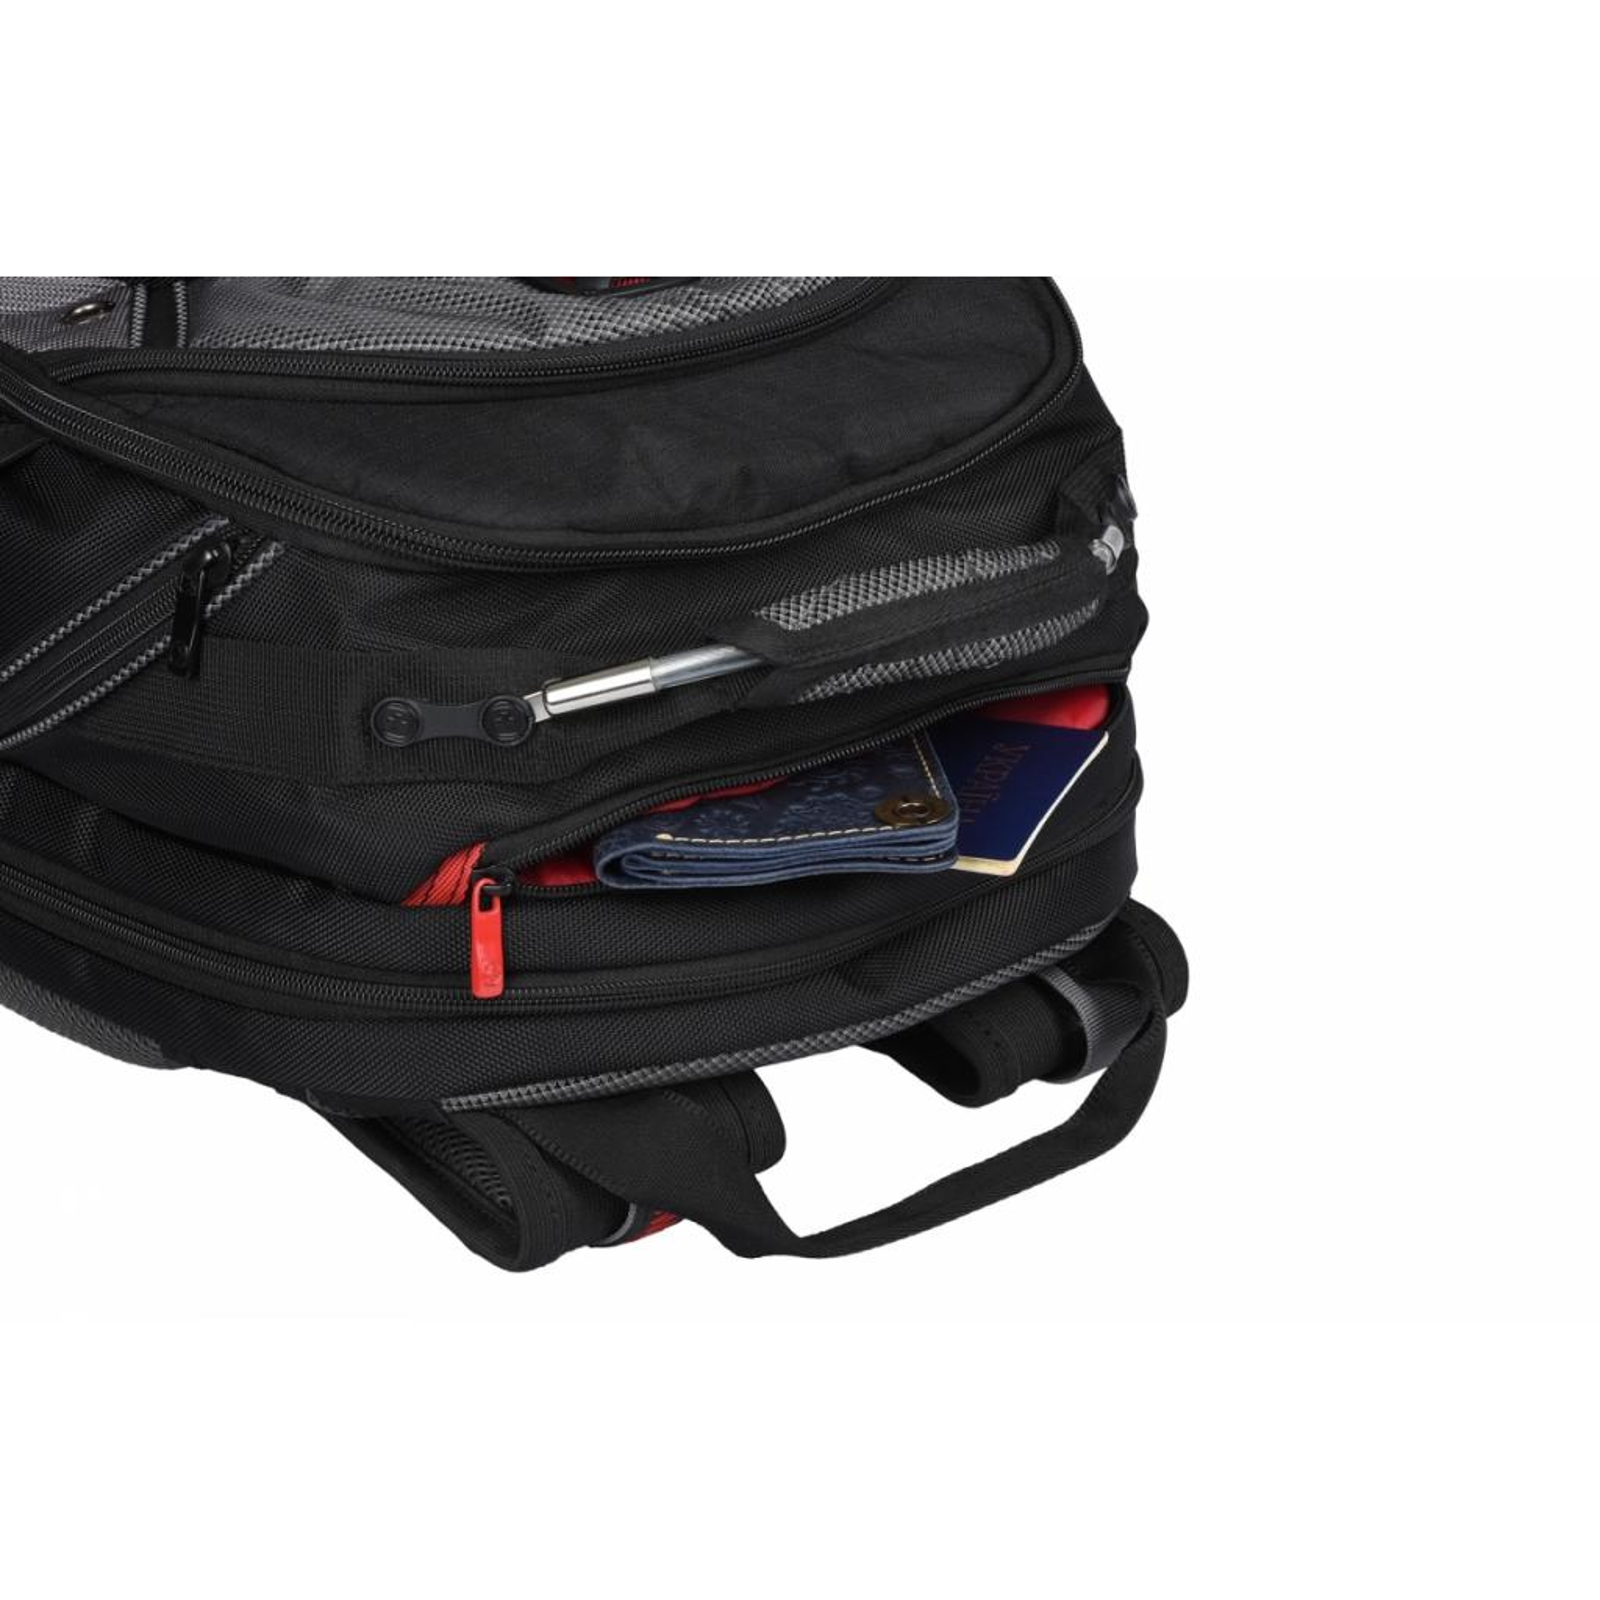 "Рюкзак для ноутбука Wenger 16"" Synergy Black/Gray (600635) изображение 10"